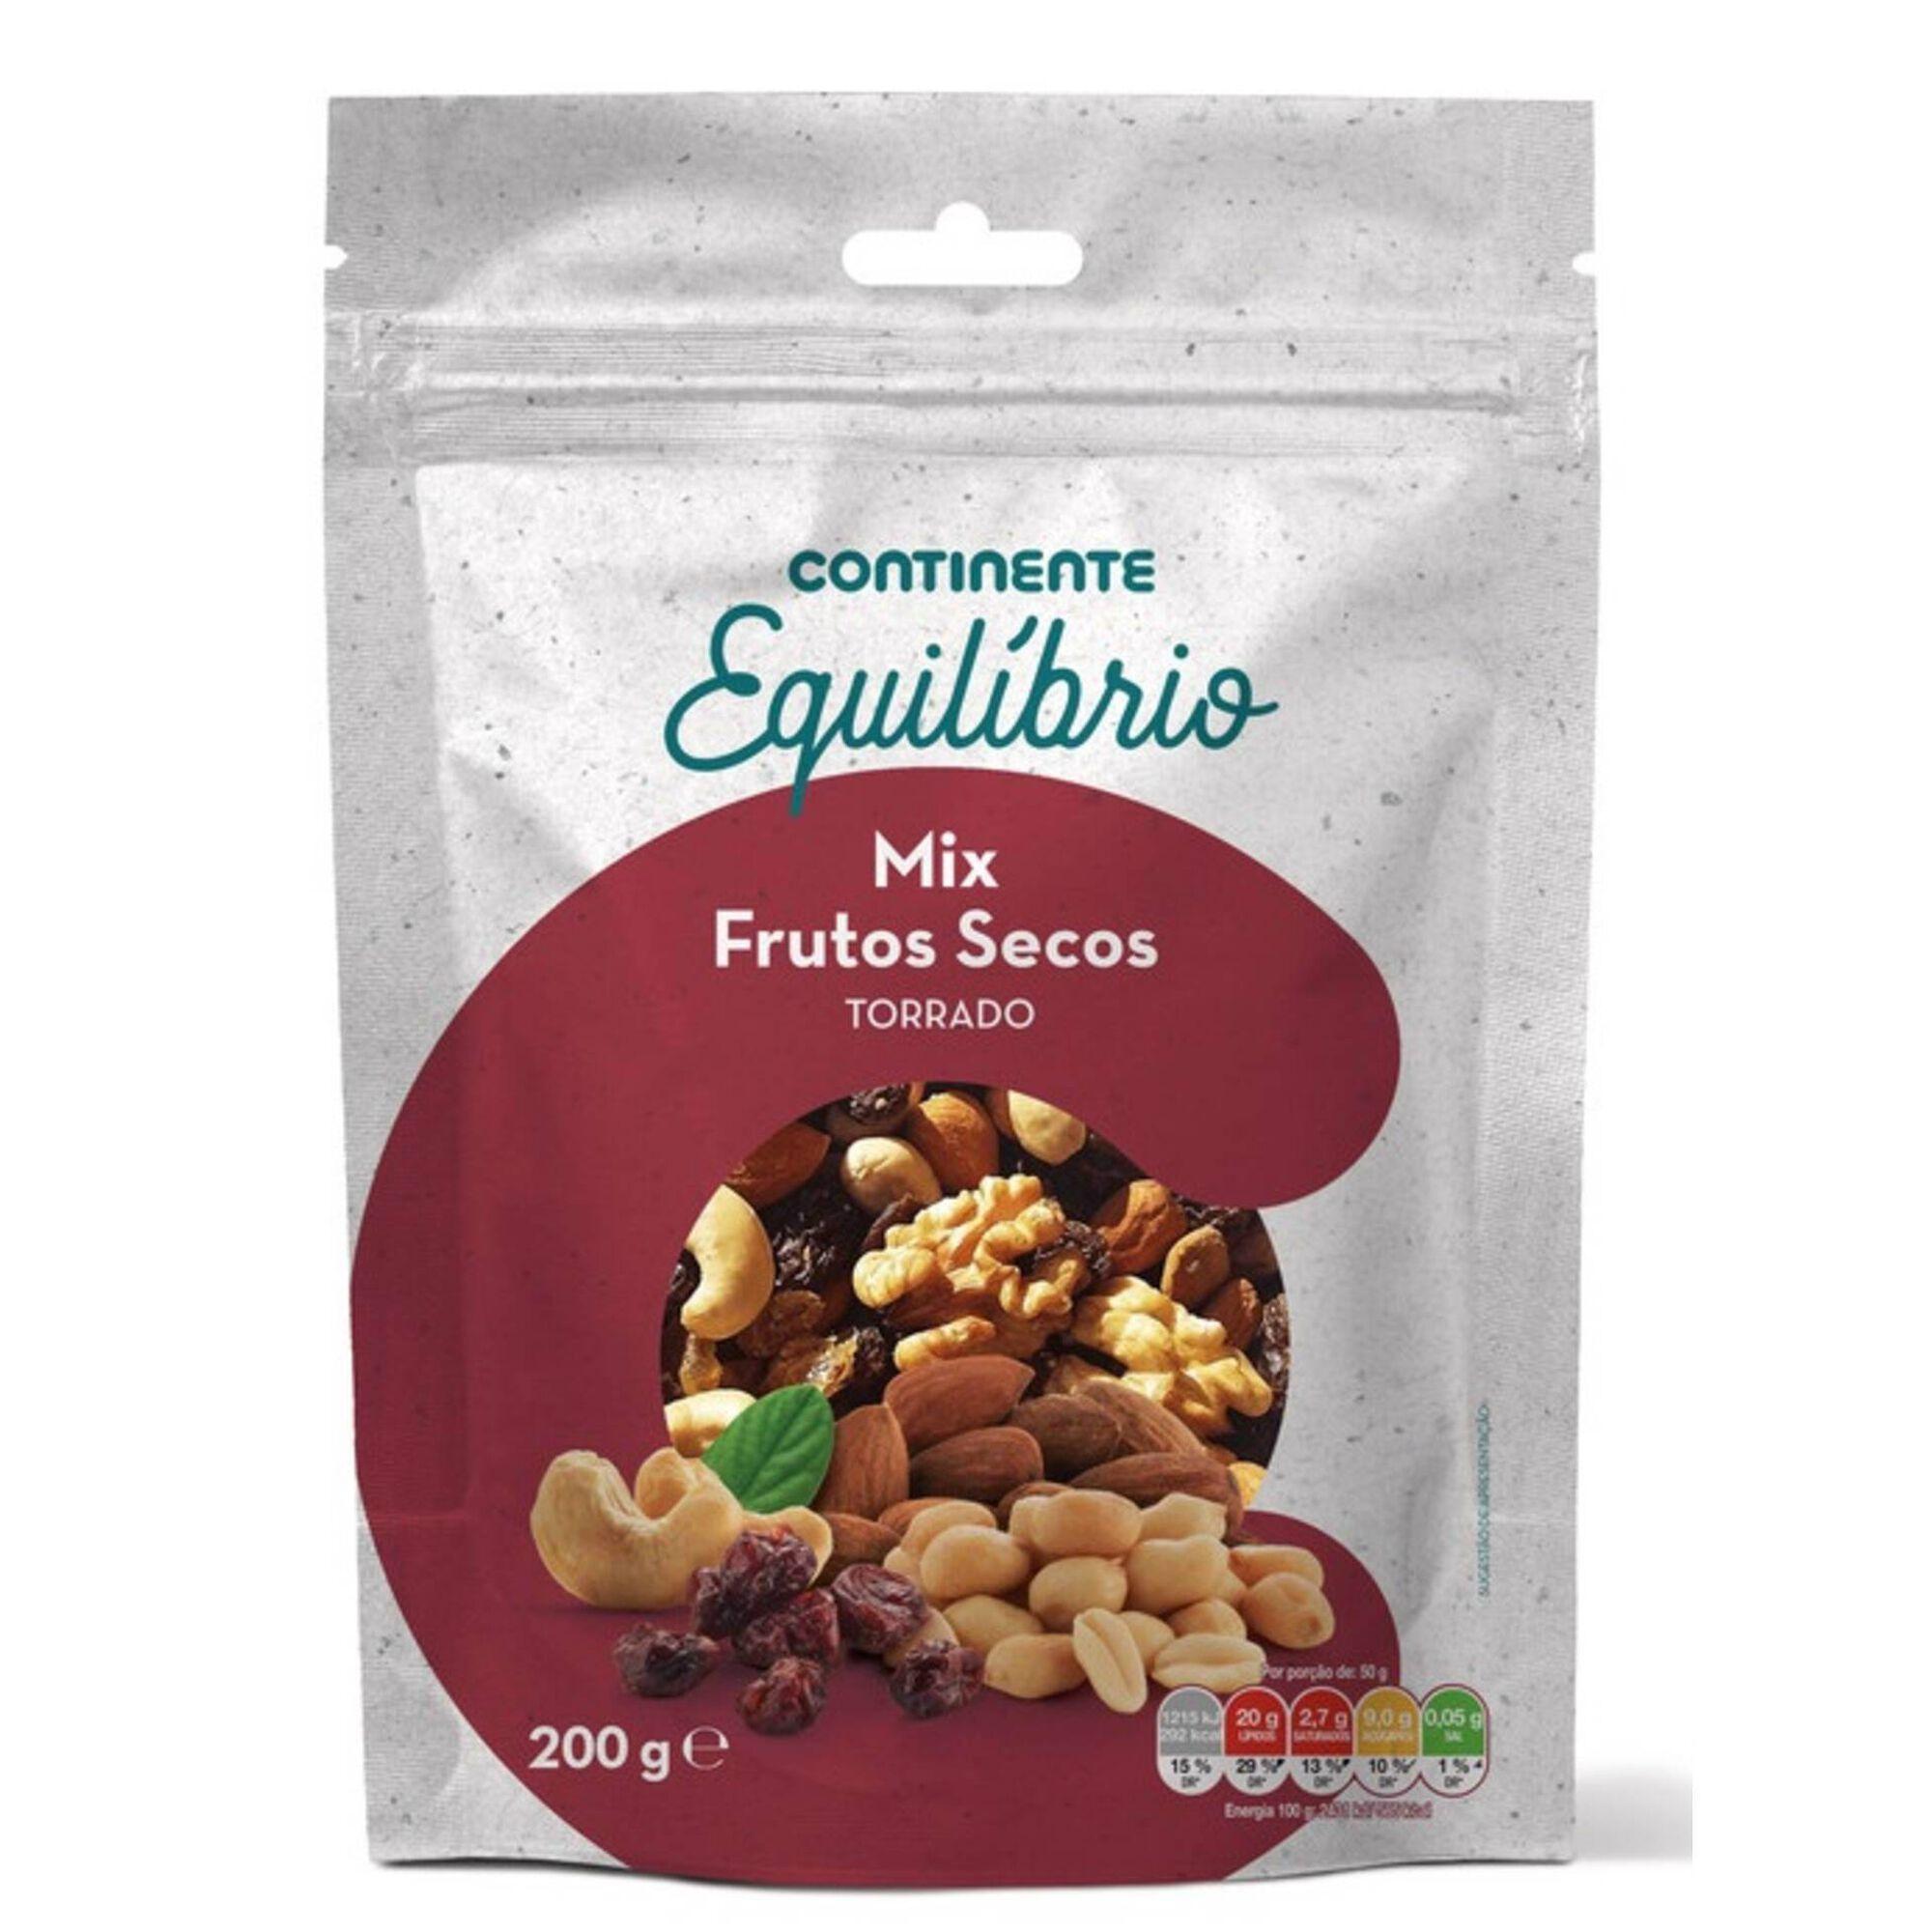 Snack Mix Frutos Secos Torrados